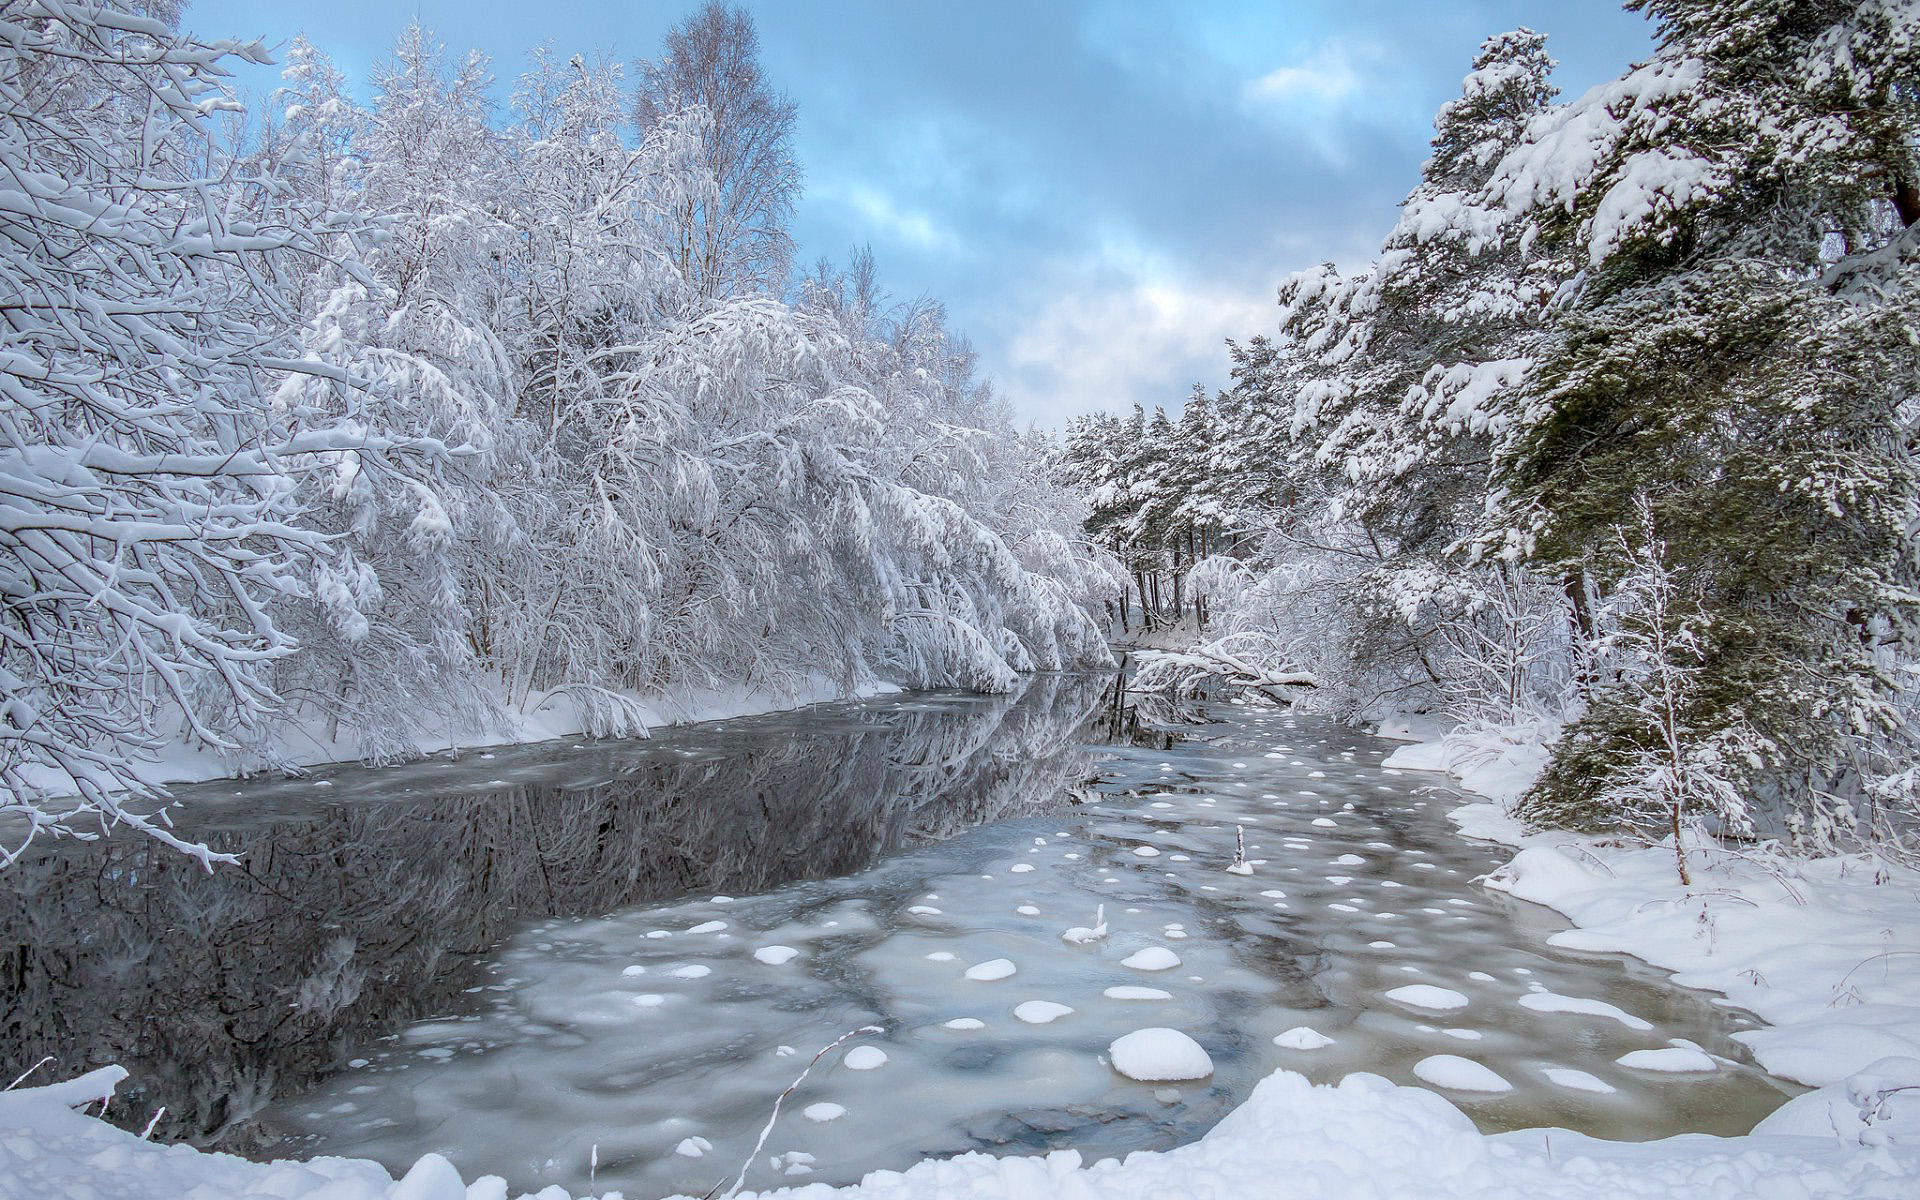 зима, лес, река, снег, деревья, природа, hd